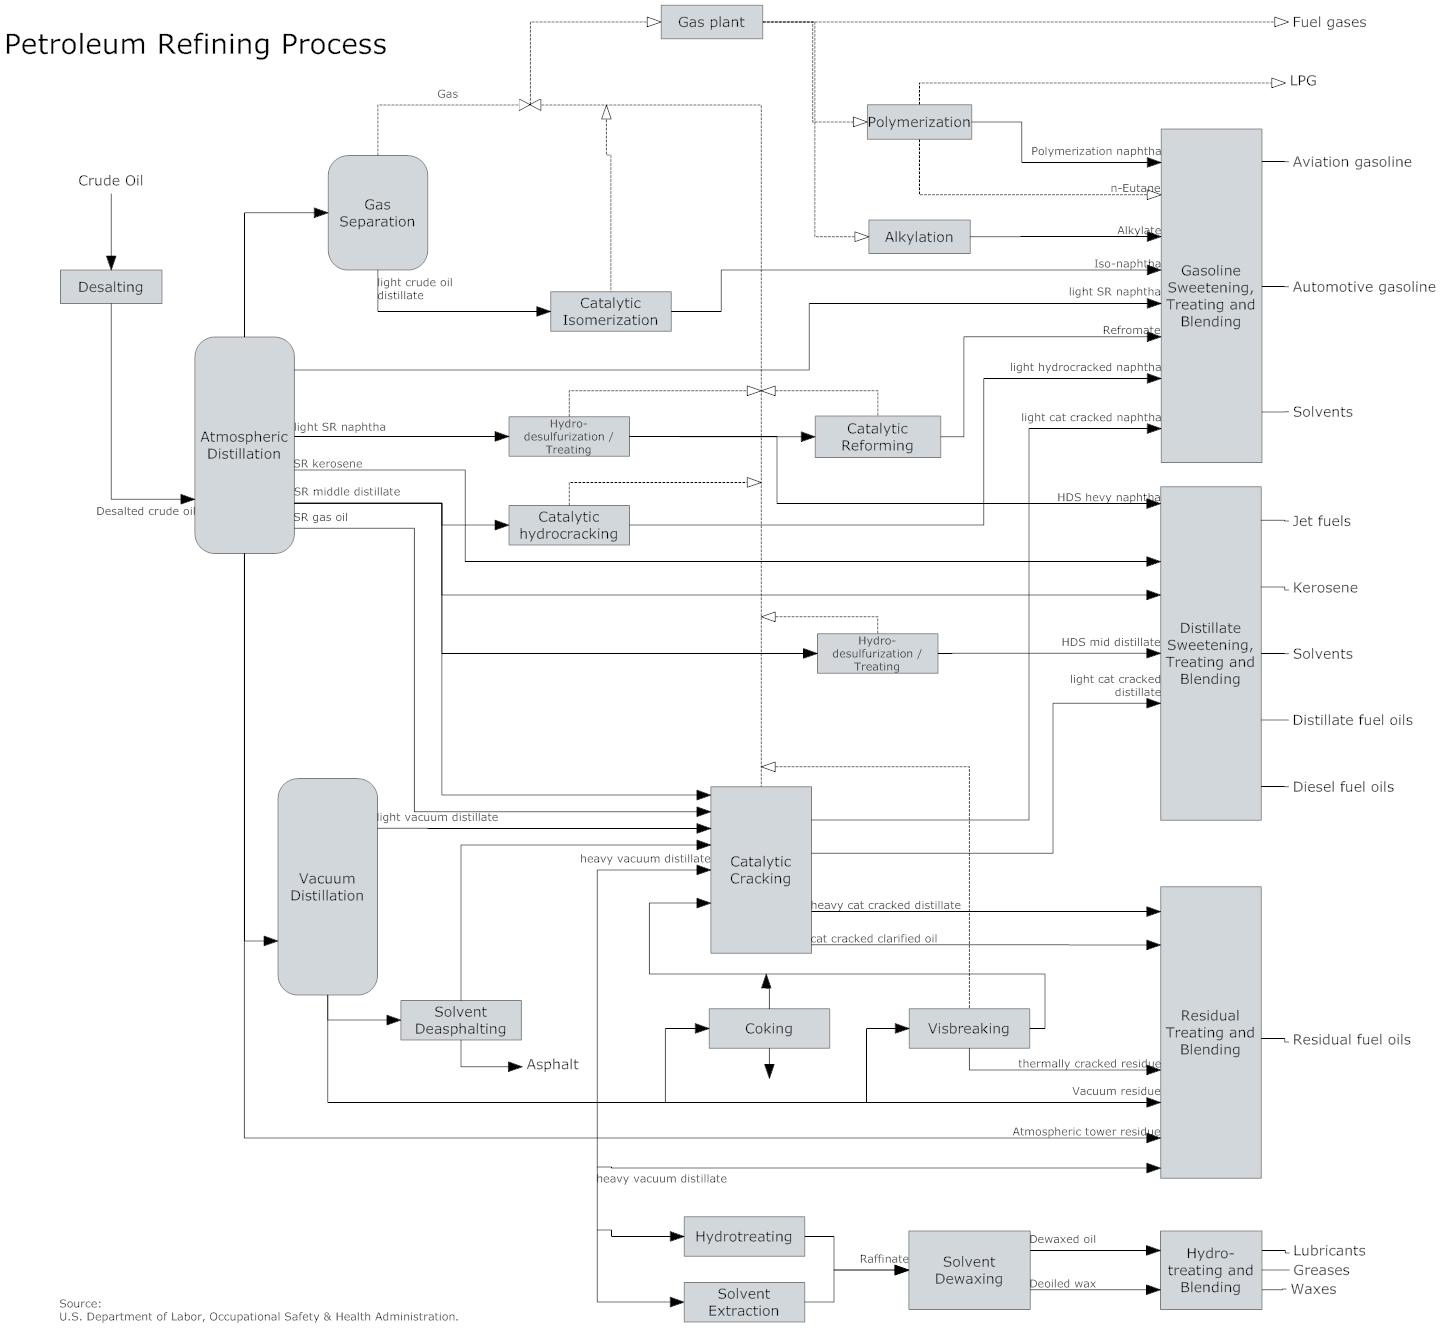 Process Flow Diagram Software - Free Process Flow Diagram PFD Templates | Workflow Diagram Vs Process Flow Diagram |  | SmartDraw